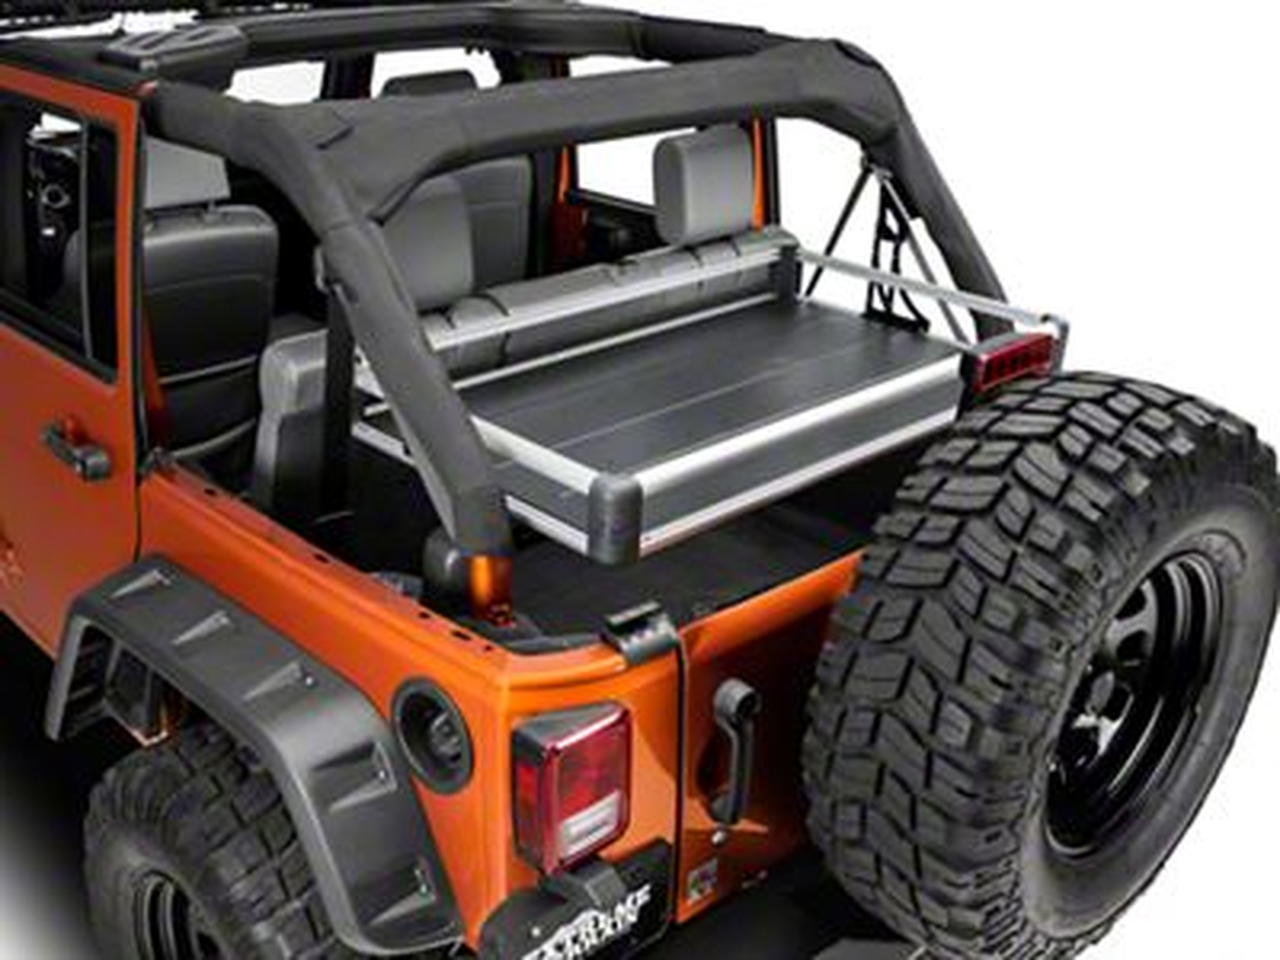 Teraflex Rear Utility Cargo Rack - Silver (07-18 Jeep Wrangler JK 4 Door)